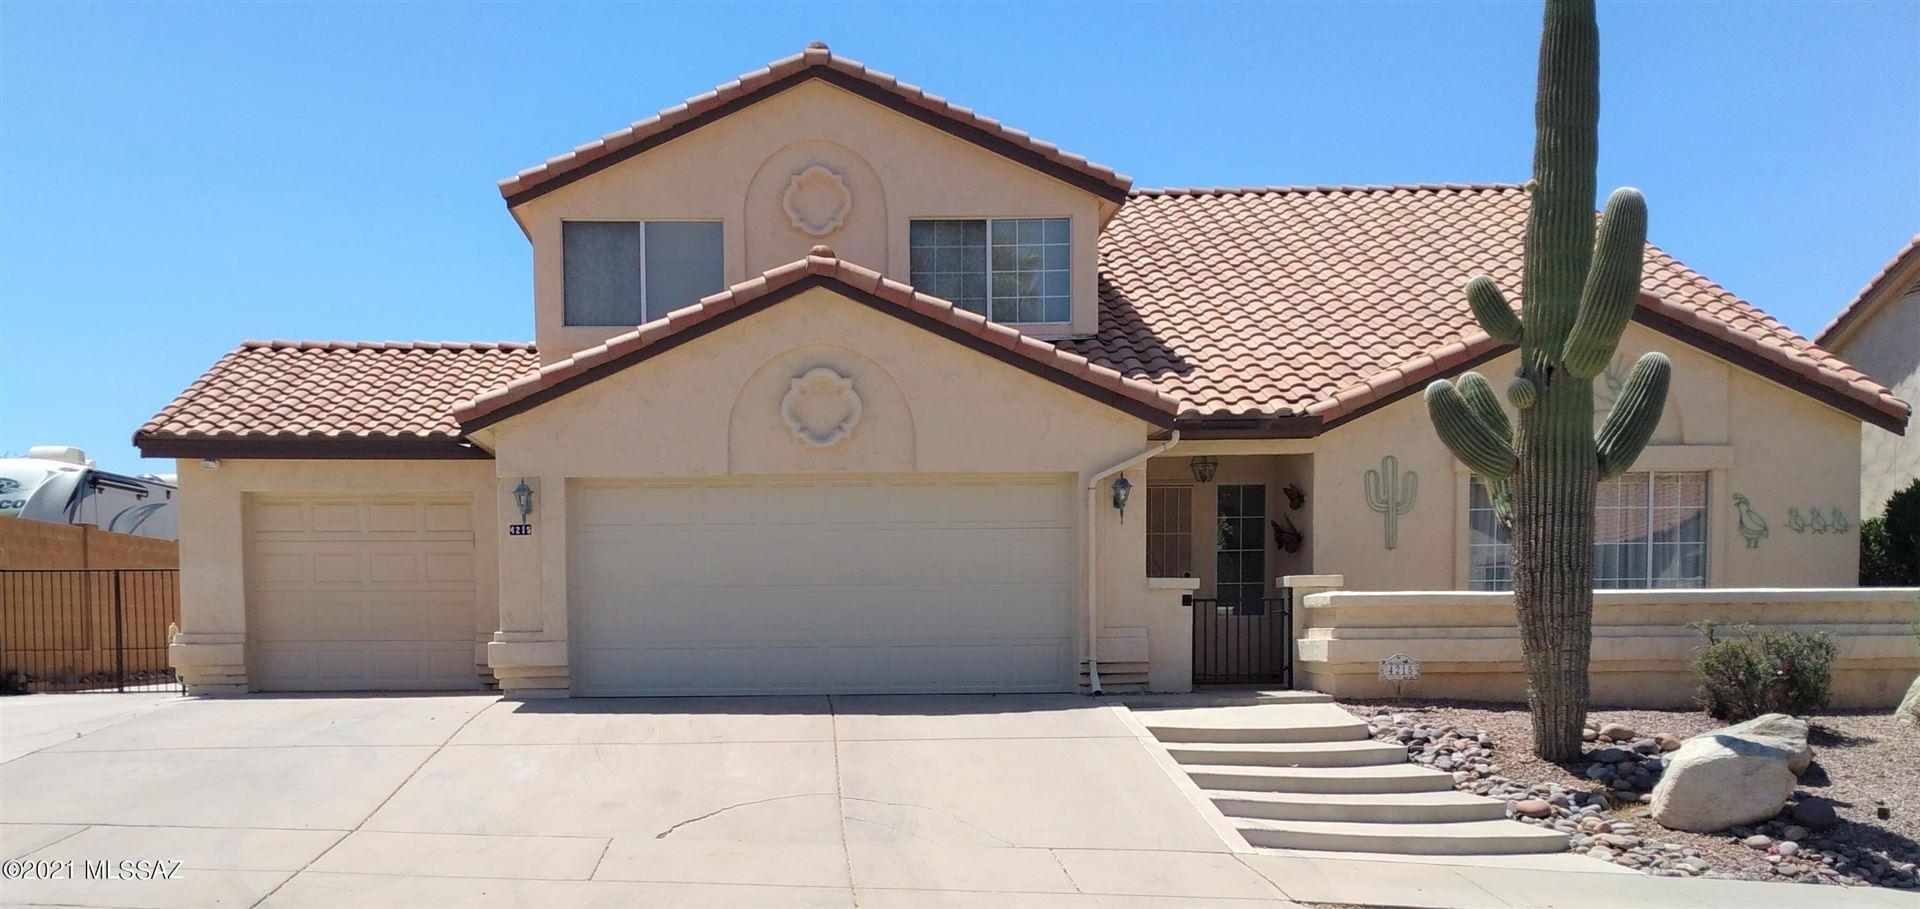 4215 W Firethorn Street, Tucson, AZ 85741 - MLS#: 22110365